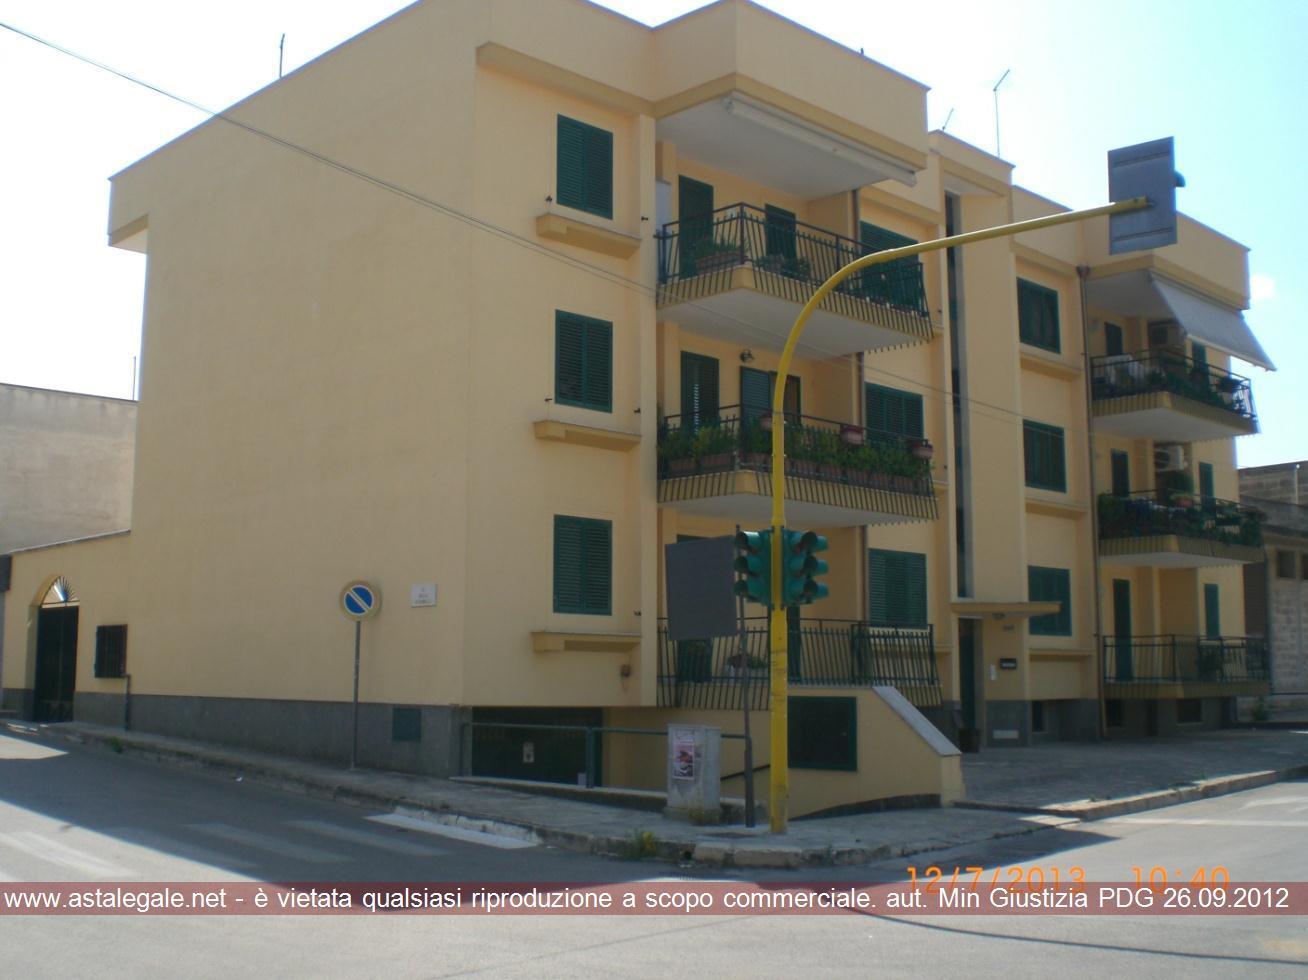 Latiano (BR) Via Torre Santa Susanna 159/a -b